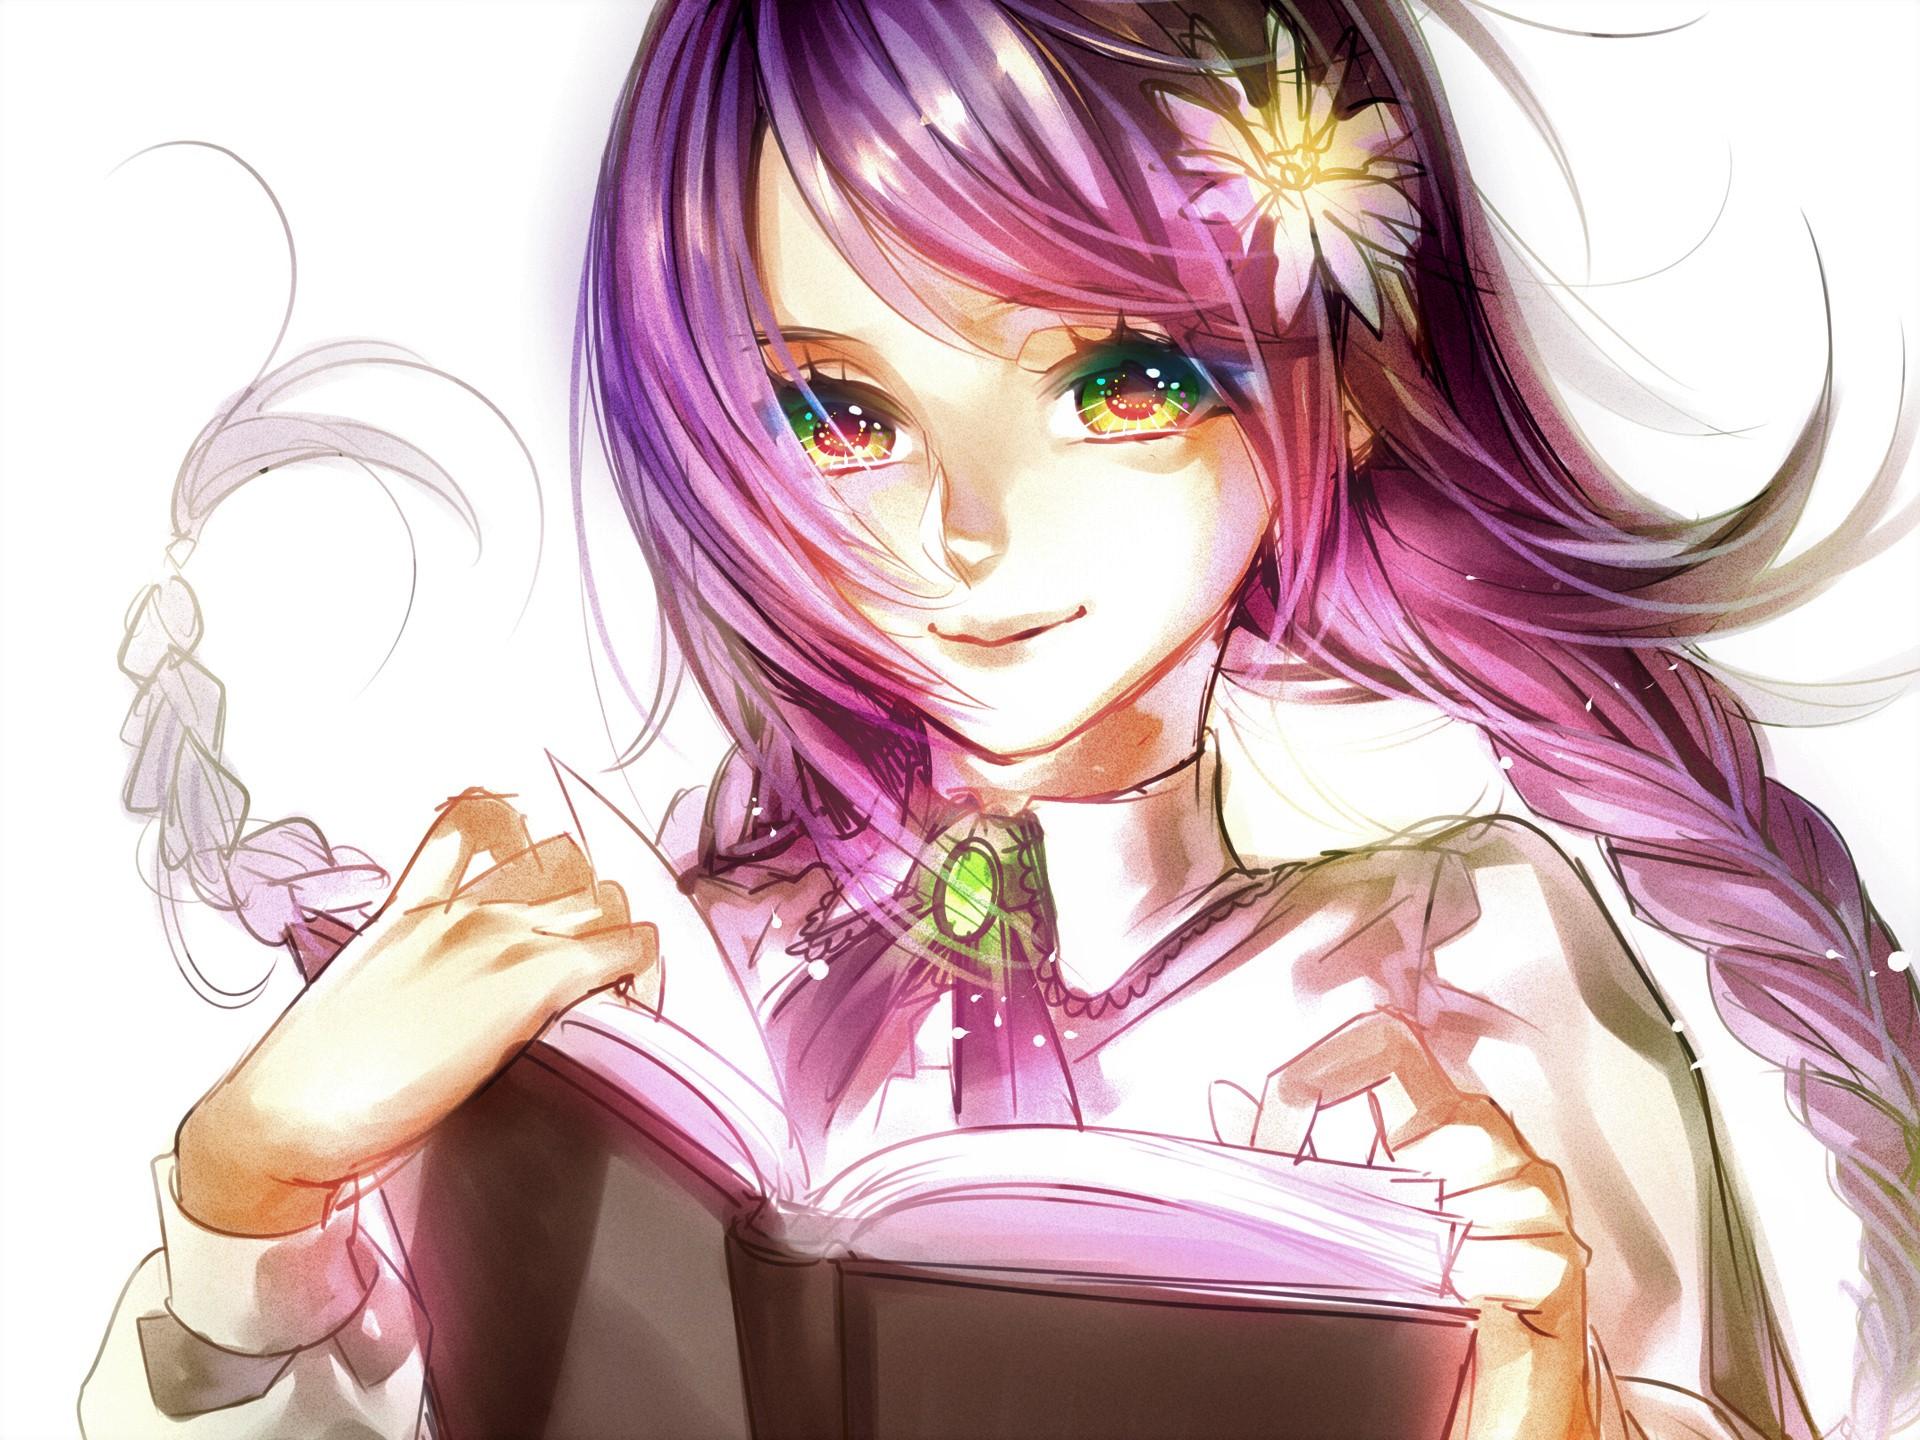 eyes green Anime pink hair girl